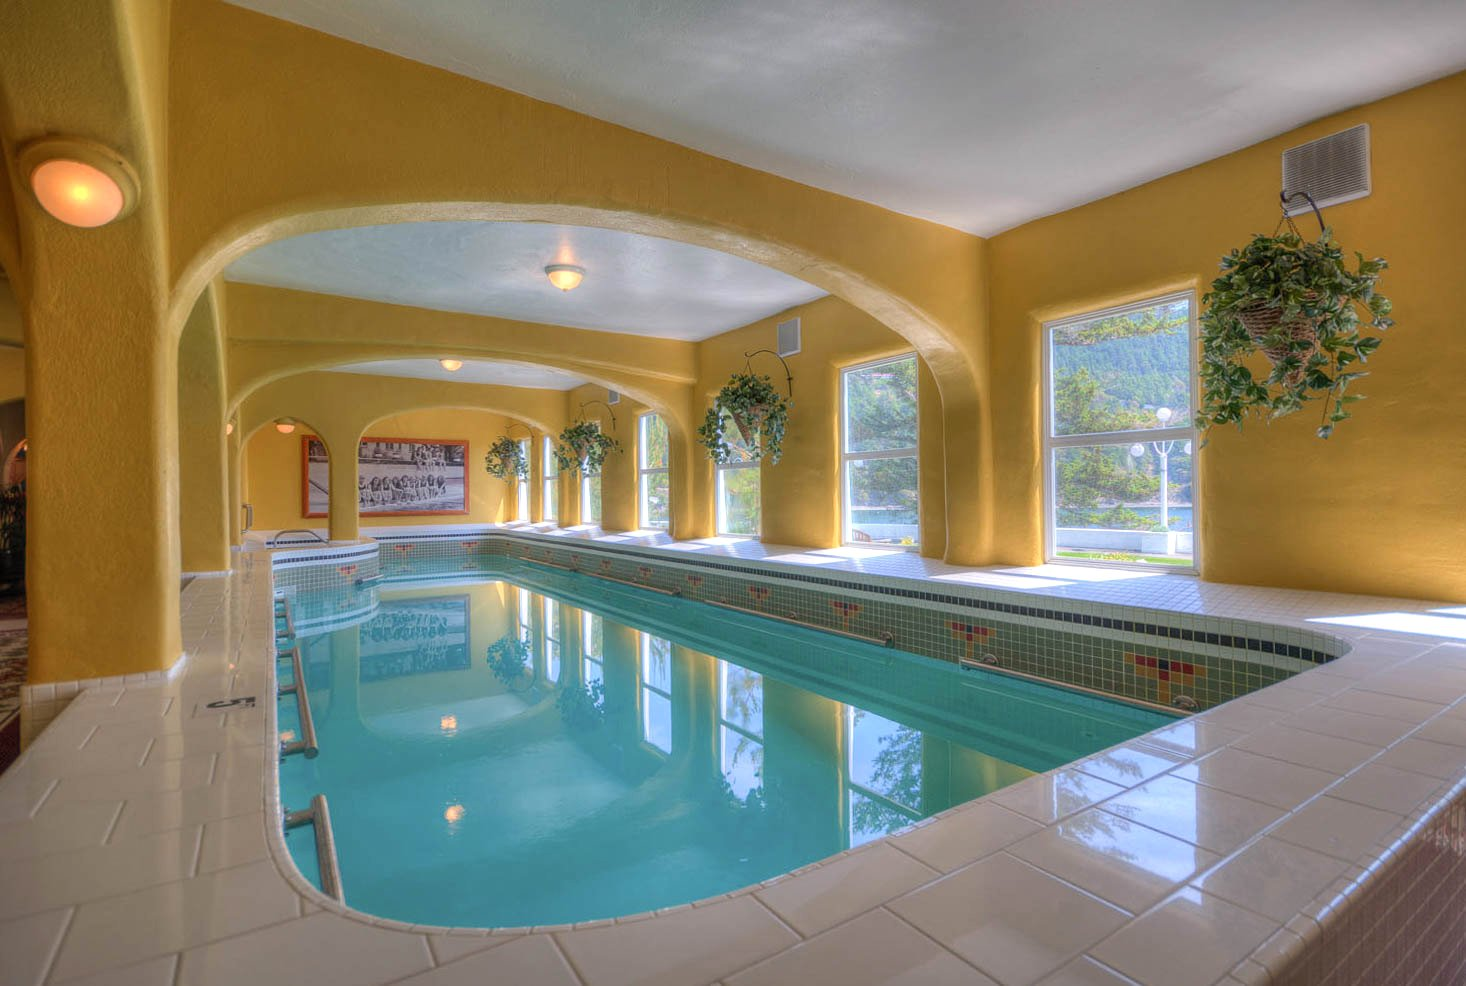 Rosario Resort and Spa